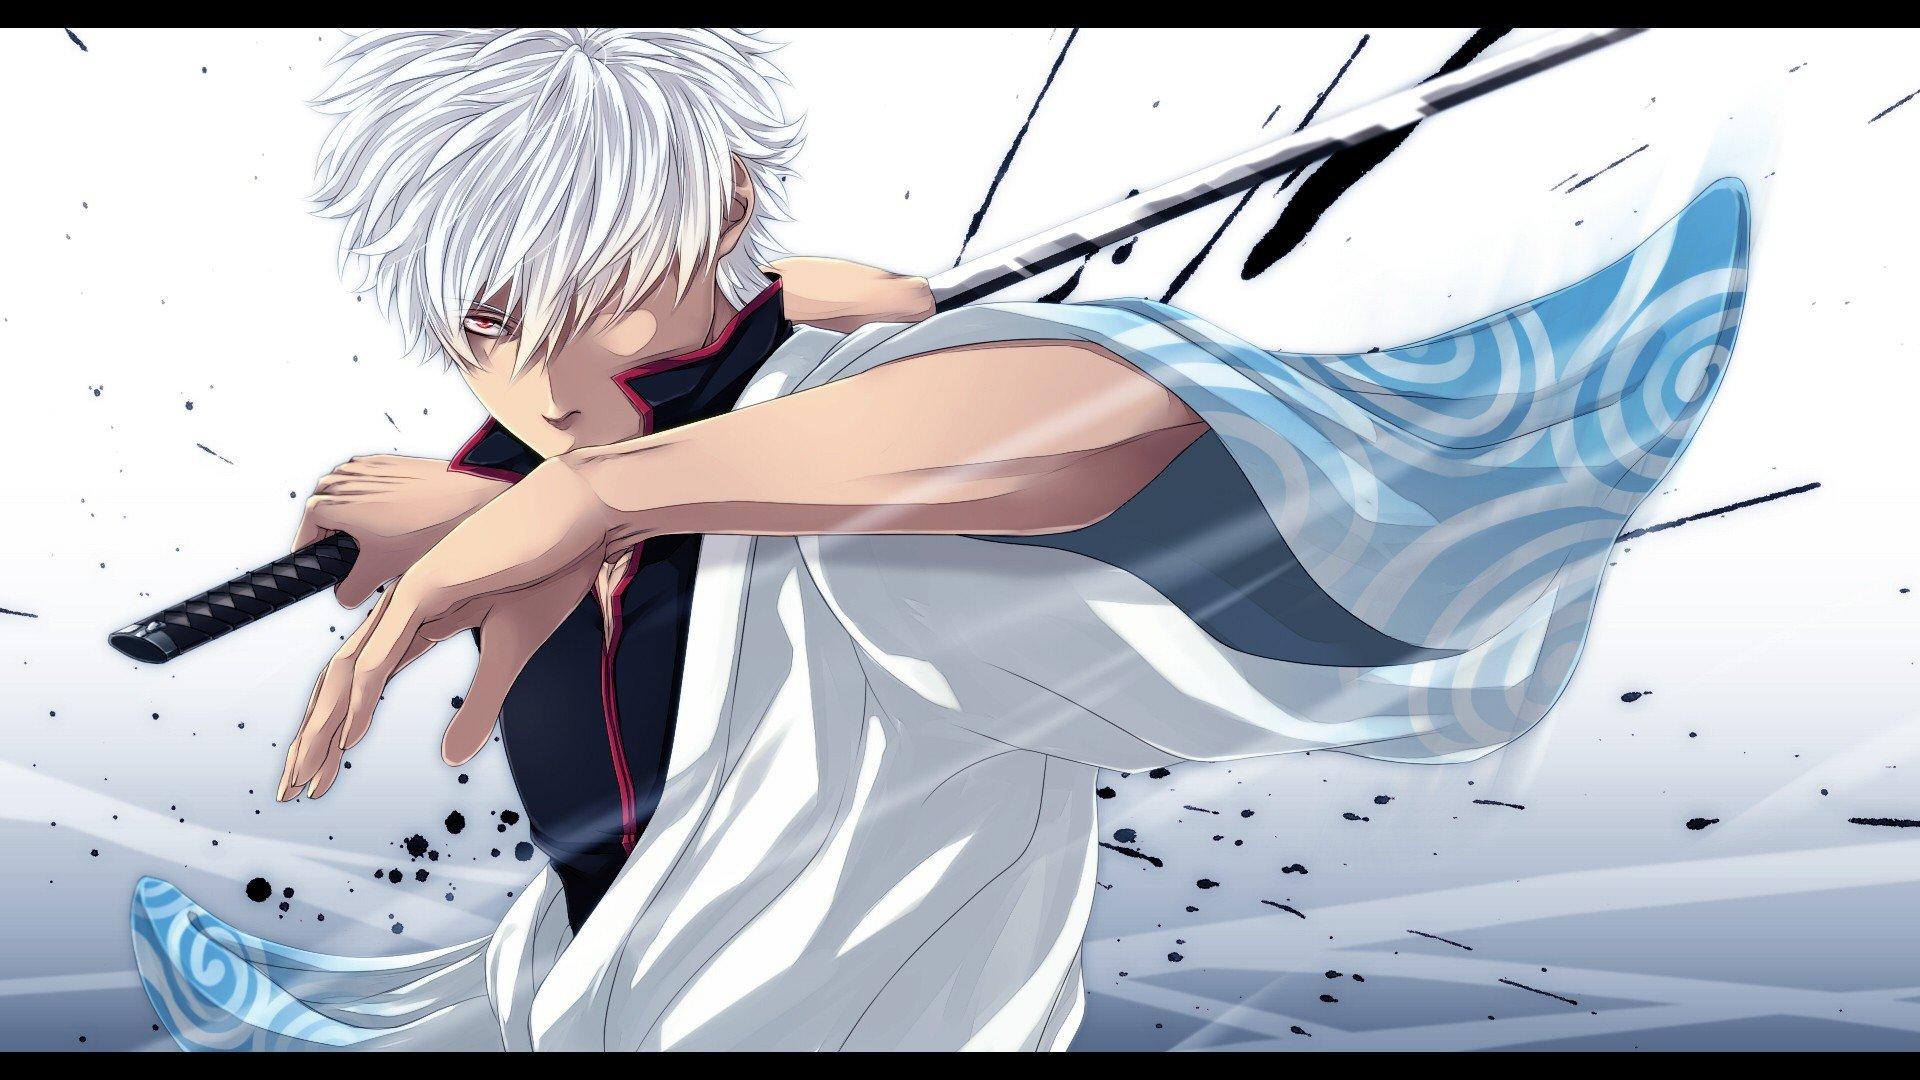 Katana Weapons Gintama Red Eyes Short Hair Sakata Gintoki Anime Anime Boys White Hair Japanese Clothes Swords Hair In Face Splashes Wallpaper 1920x1080 299191 Wallpaperup